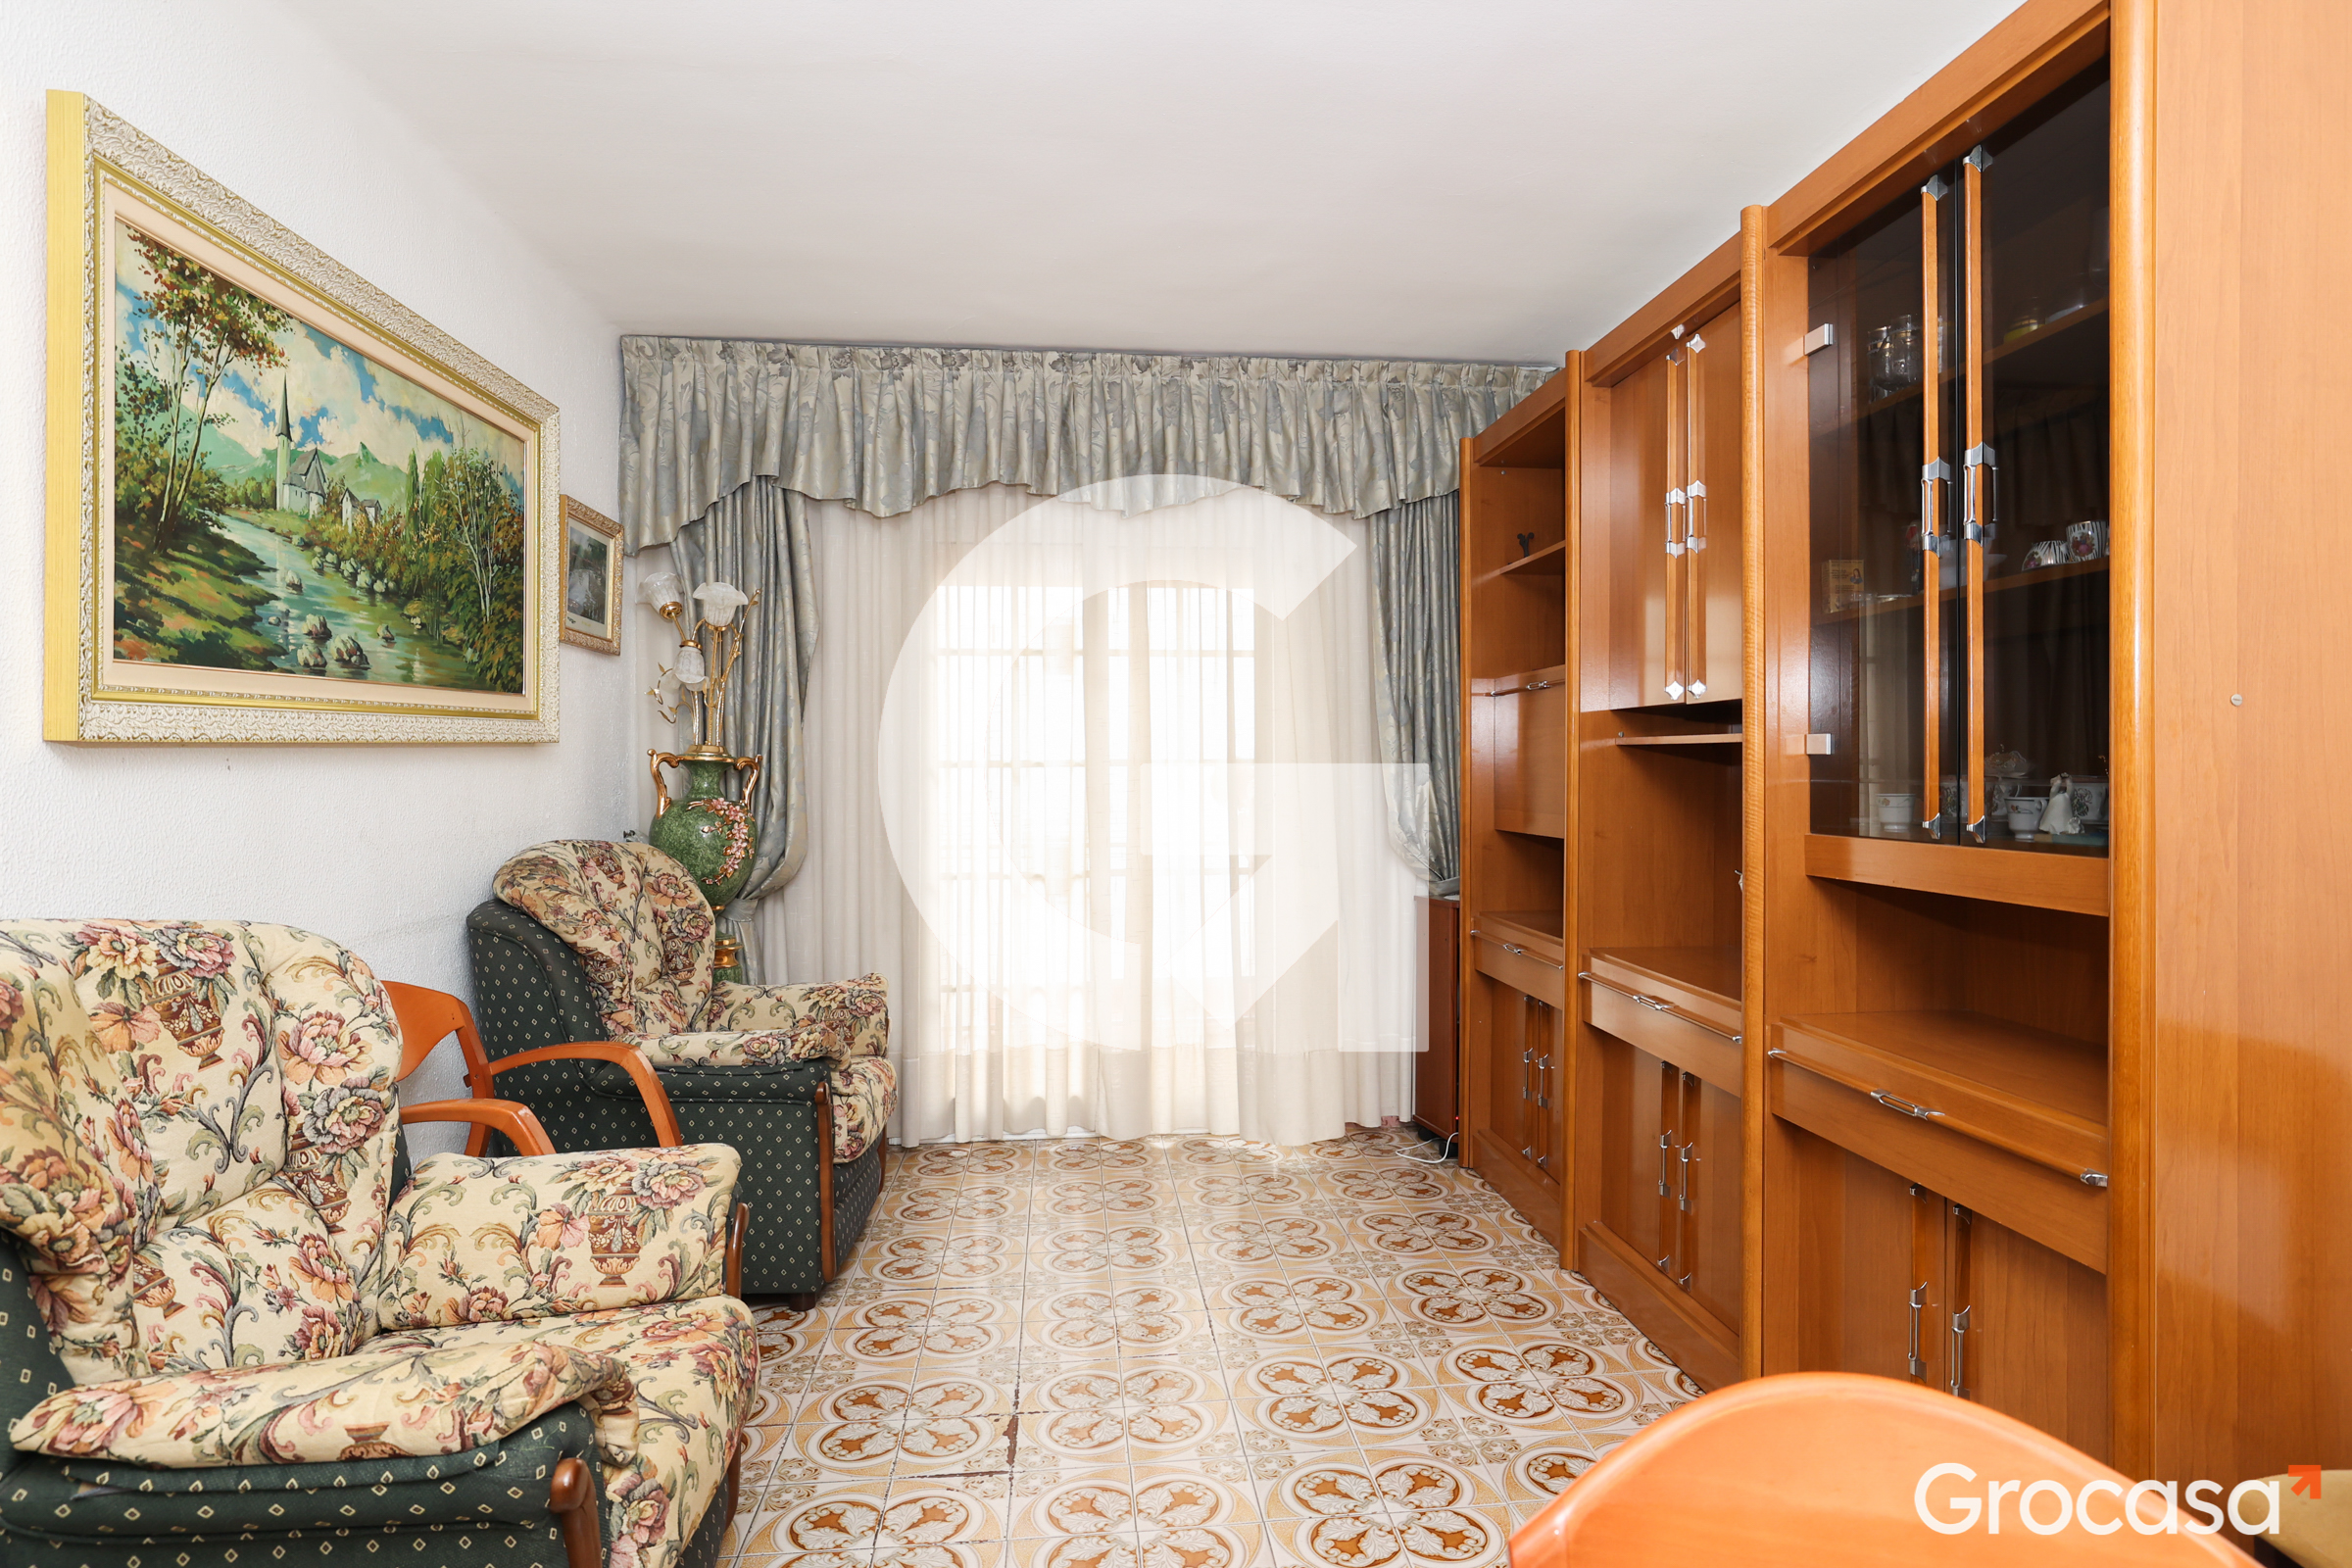 Piso en Can vidalet en Esplugues de Llobregat en Venta por 157.000€